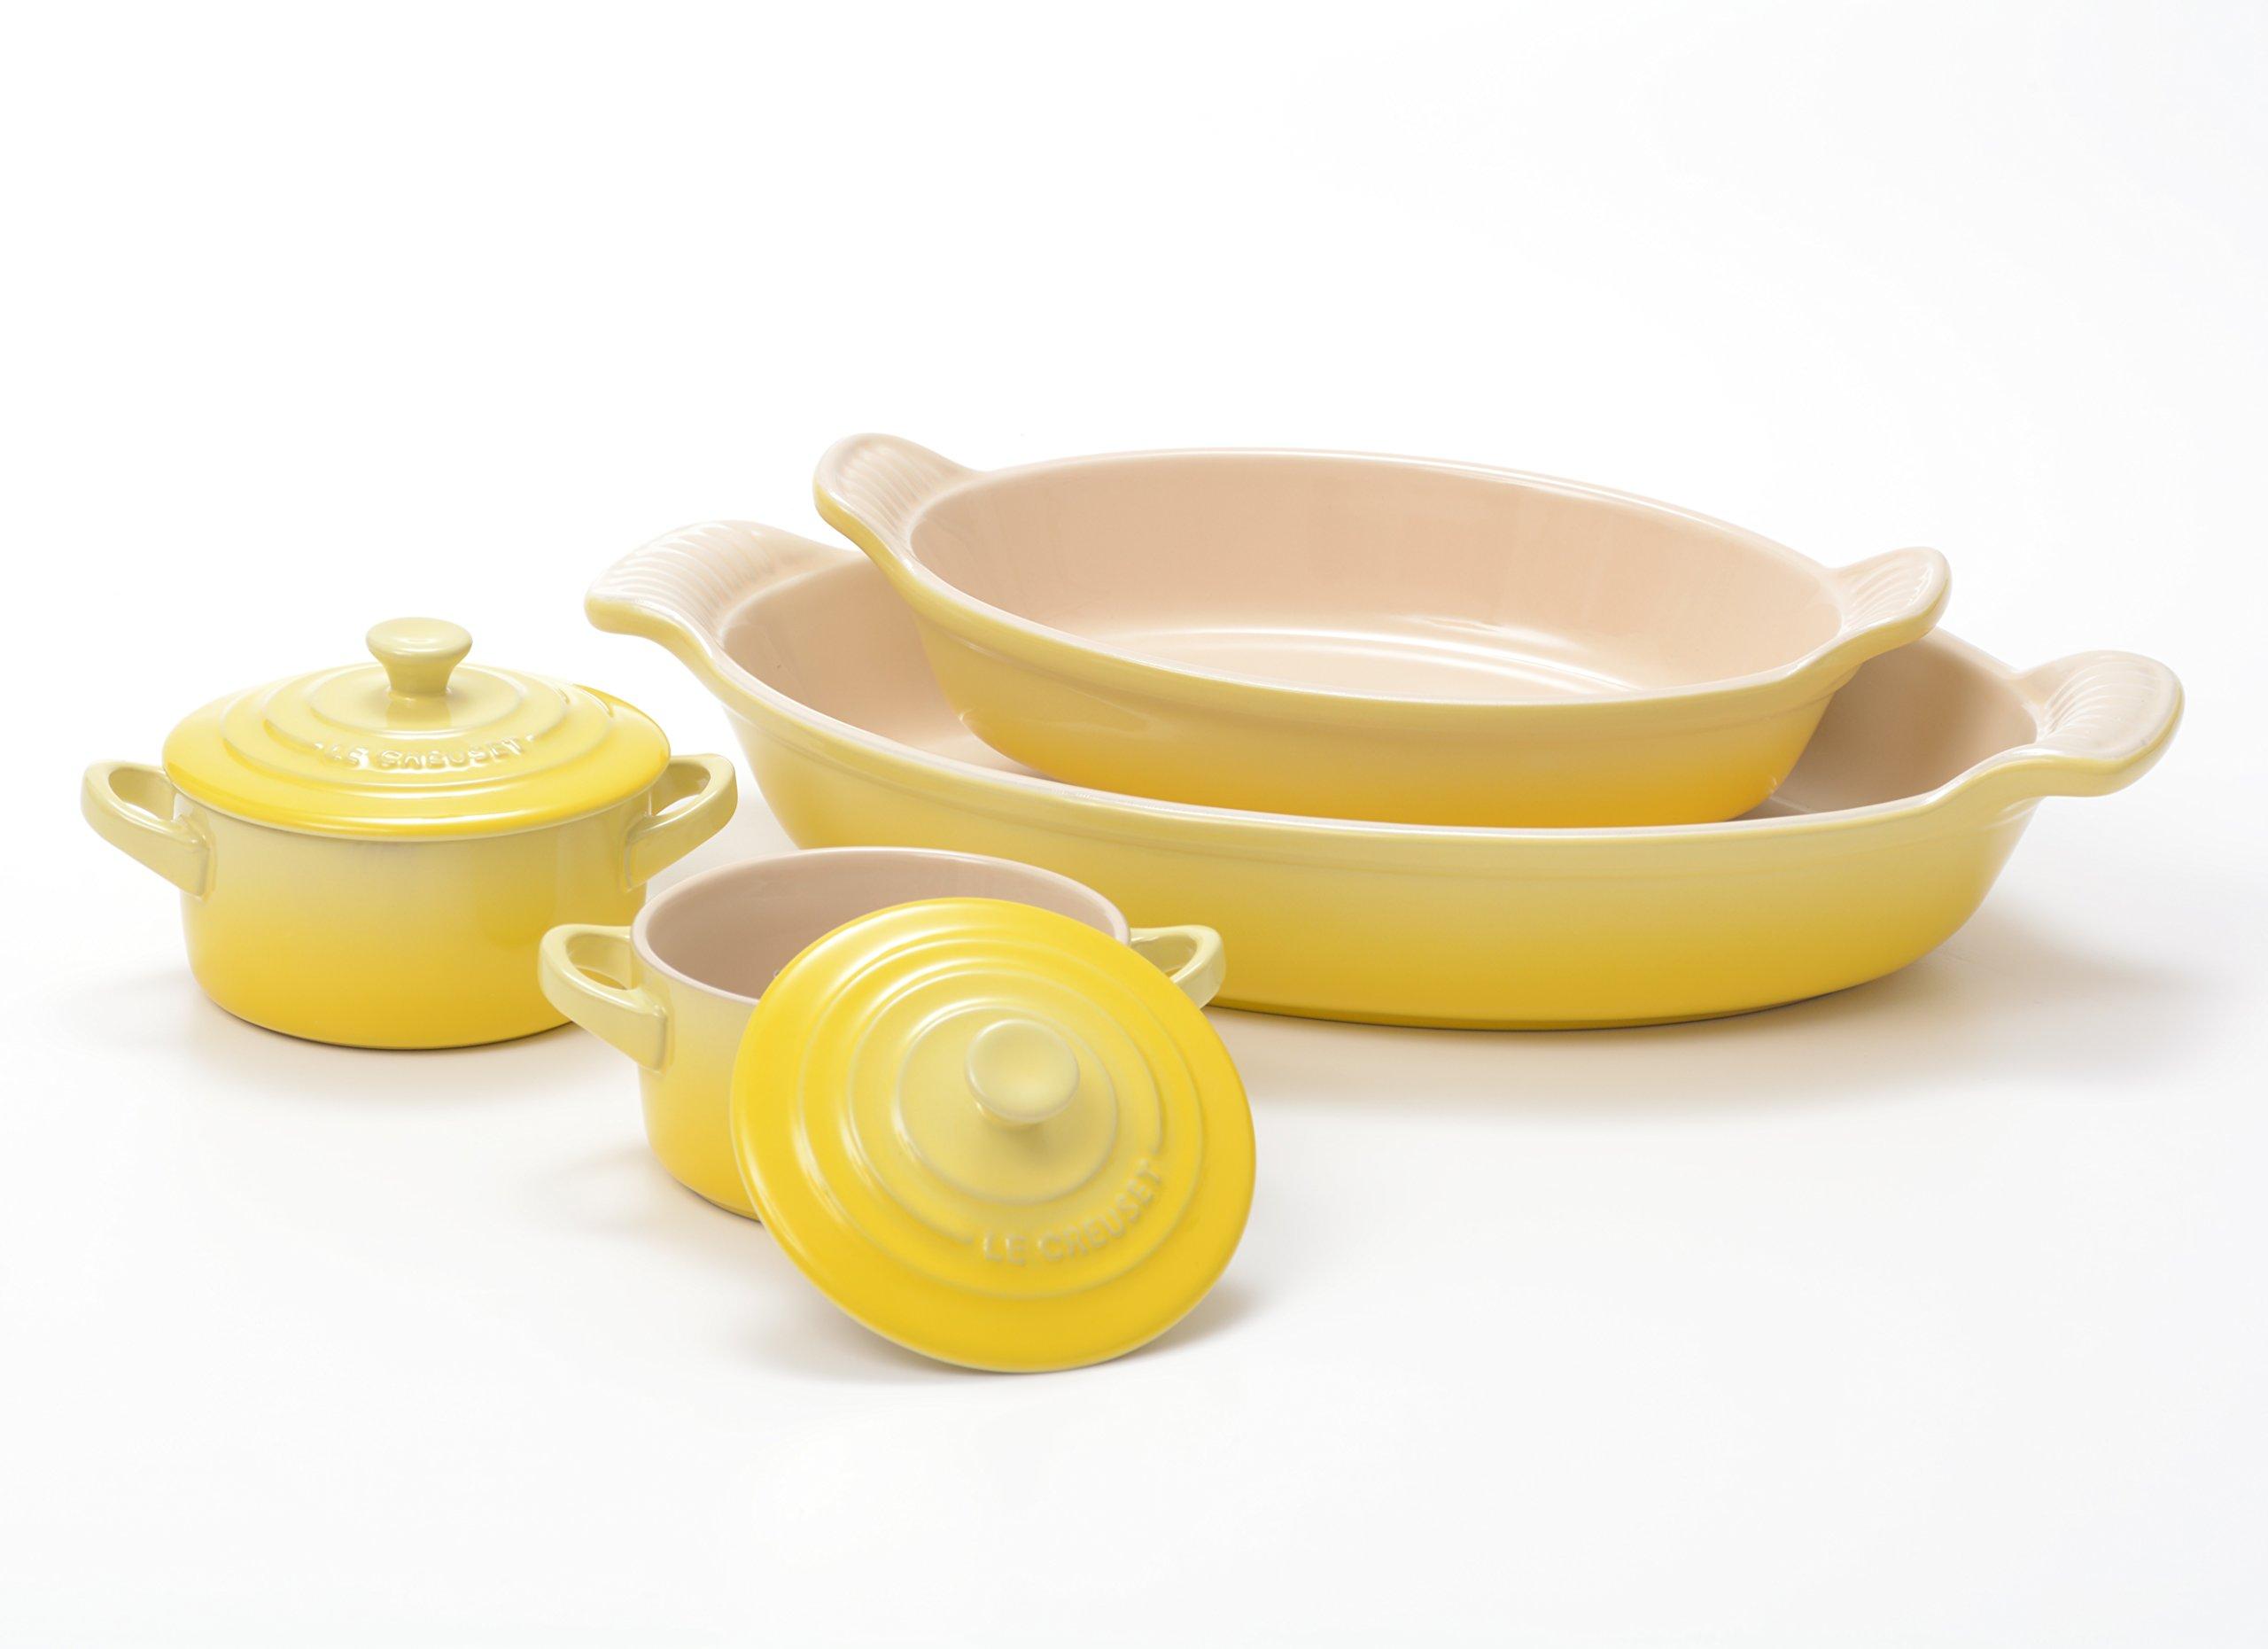 Le Creuset Heritage Soleil Yellow Stoneware 2 Piece Au Gratin Dish Set with 2 Mini Cocottes